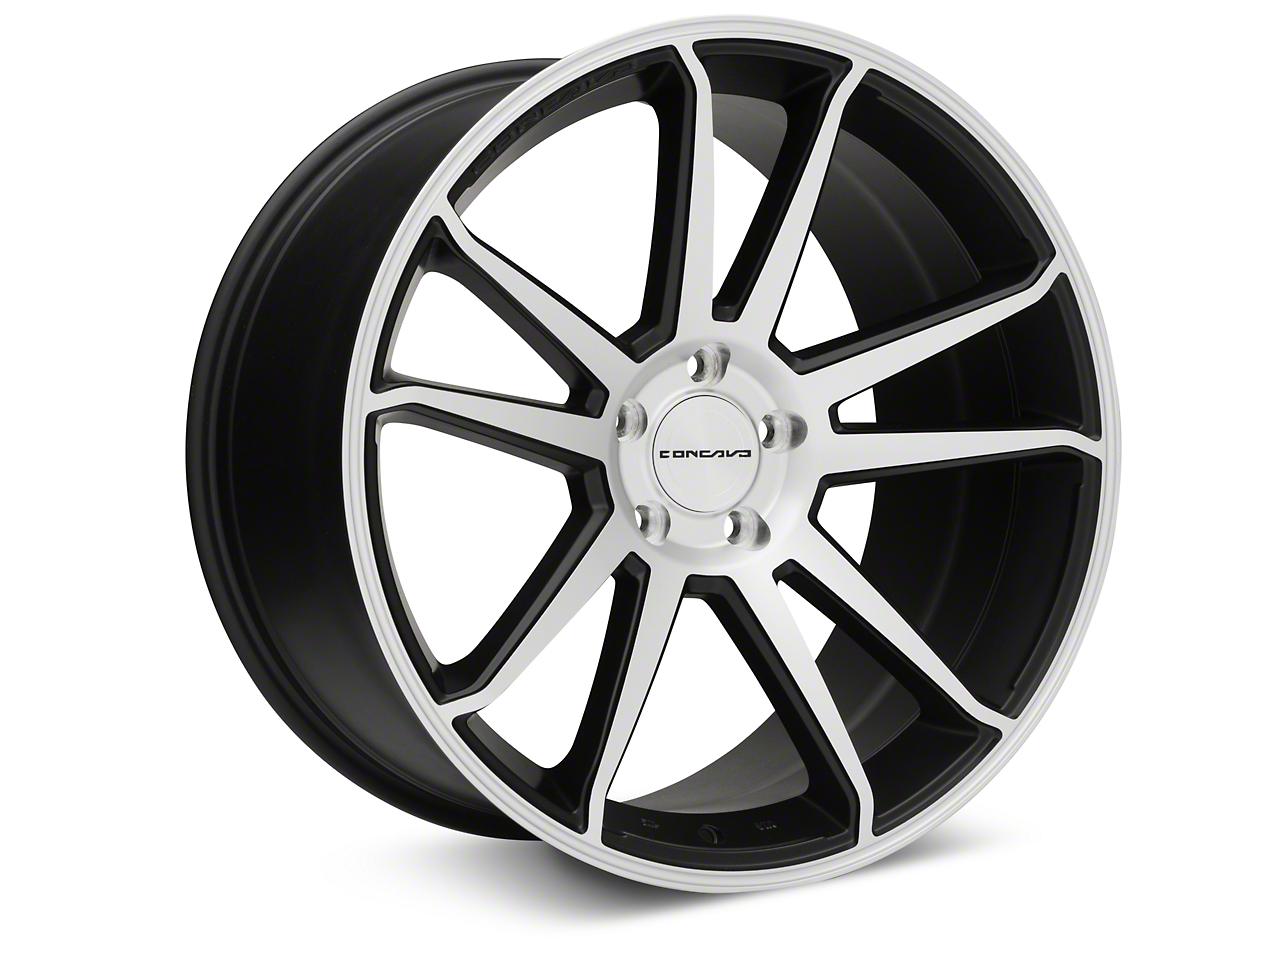 Concavo CW-S5 Matte Black Machined Wheel - 20x10.5 (05-14 All)